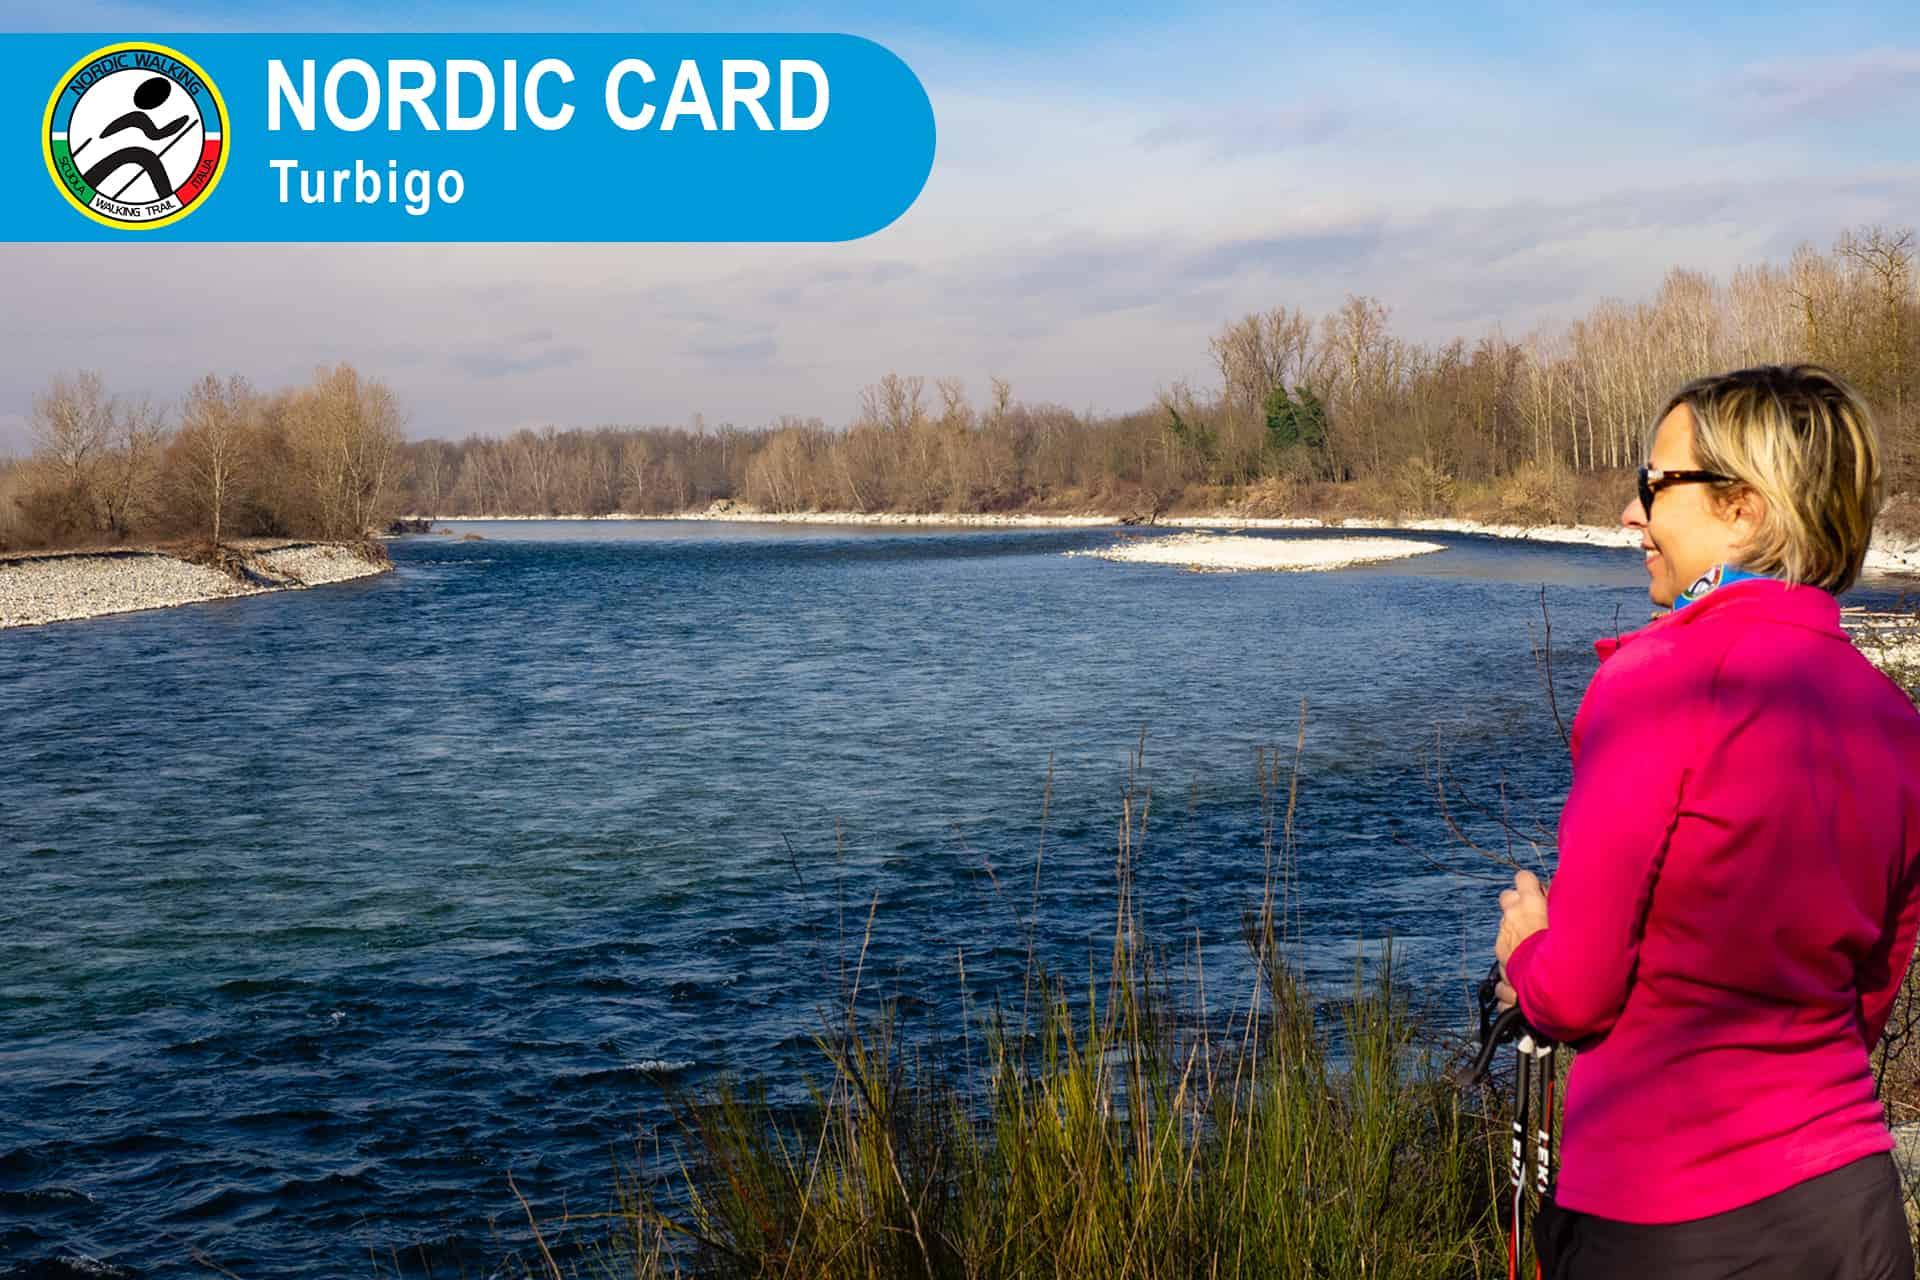 Nordic Card Camminata Nordic Walking a Turbigo - Roberto Fontana Istruttore Nordic Walking Scuola Walking Trail Italia